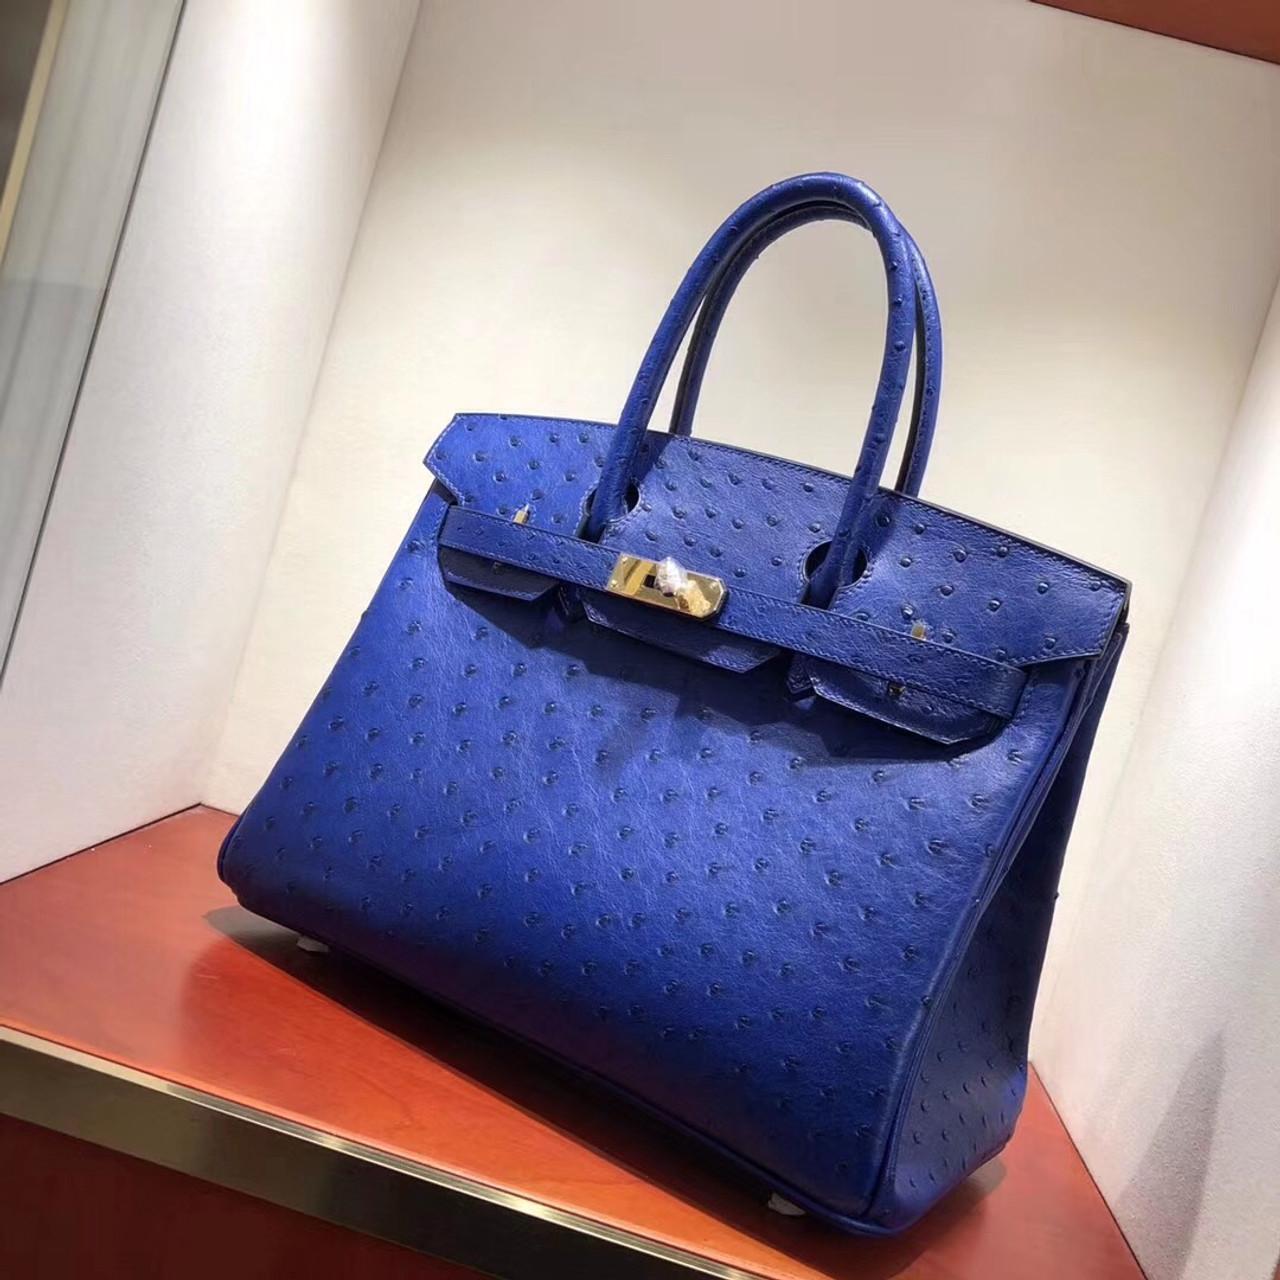 38b18ab5c6 ... italy hermes t7 blue hydra birkin bag 30cm kk ostrich leather gold  hardware ba450 1d10a